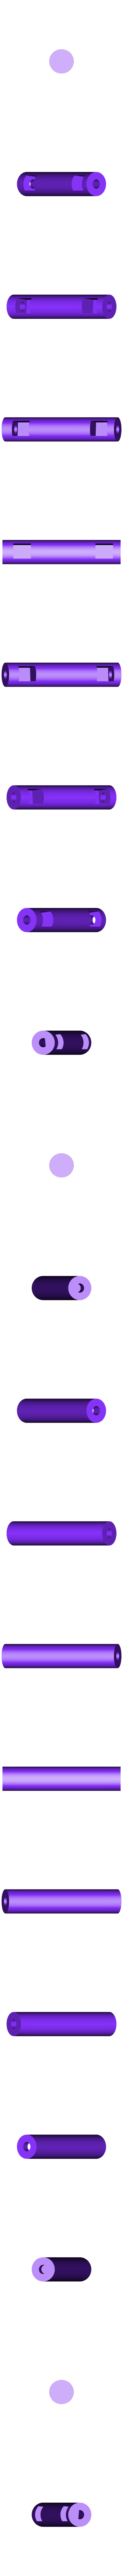 BoomExteriorRod.stl Download free STL file MXL 4000 Shock Mount (Custom) • 3D printer object, ProteanMan